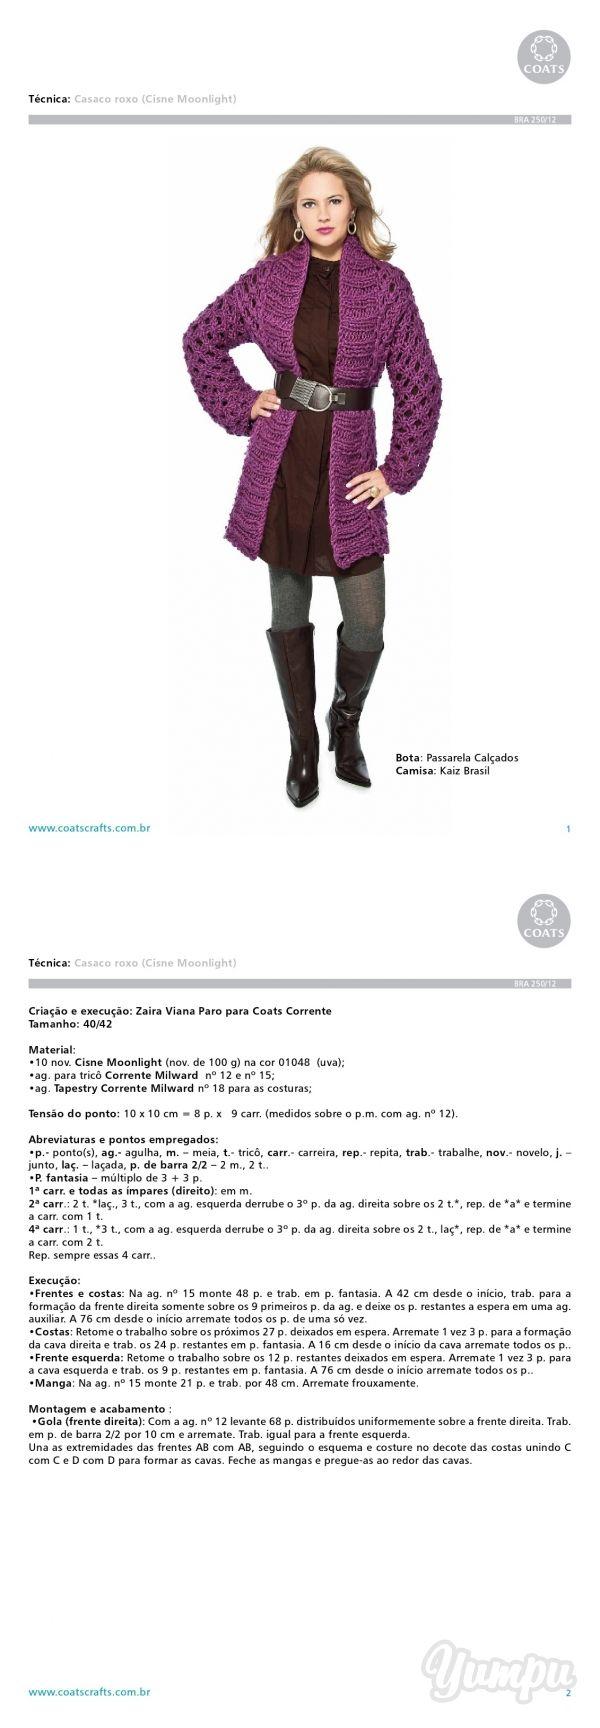 www.coatscrafts.com.br Técnica: Casaco roxo (Cisne Moonlight ... - Magazine with 3 pages: www.coatscrafts.com.br Técnica: Casaco roxo (Cisne Moonlight ...